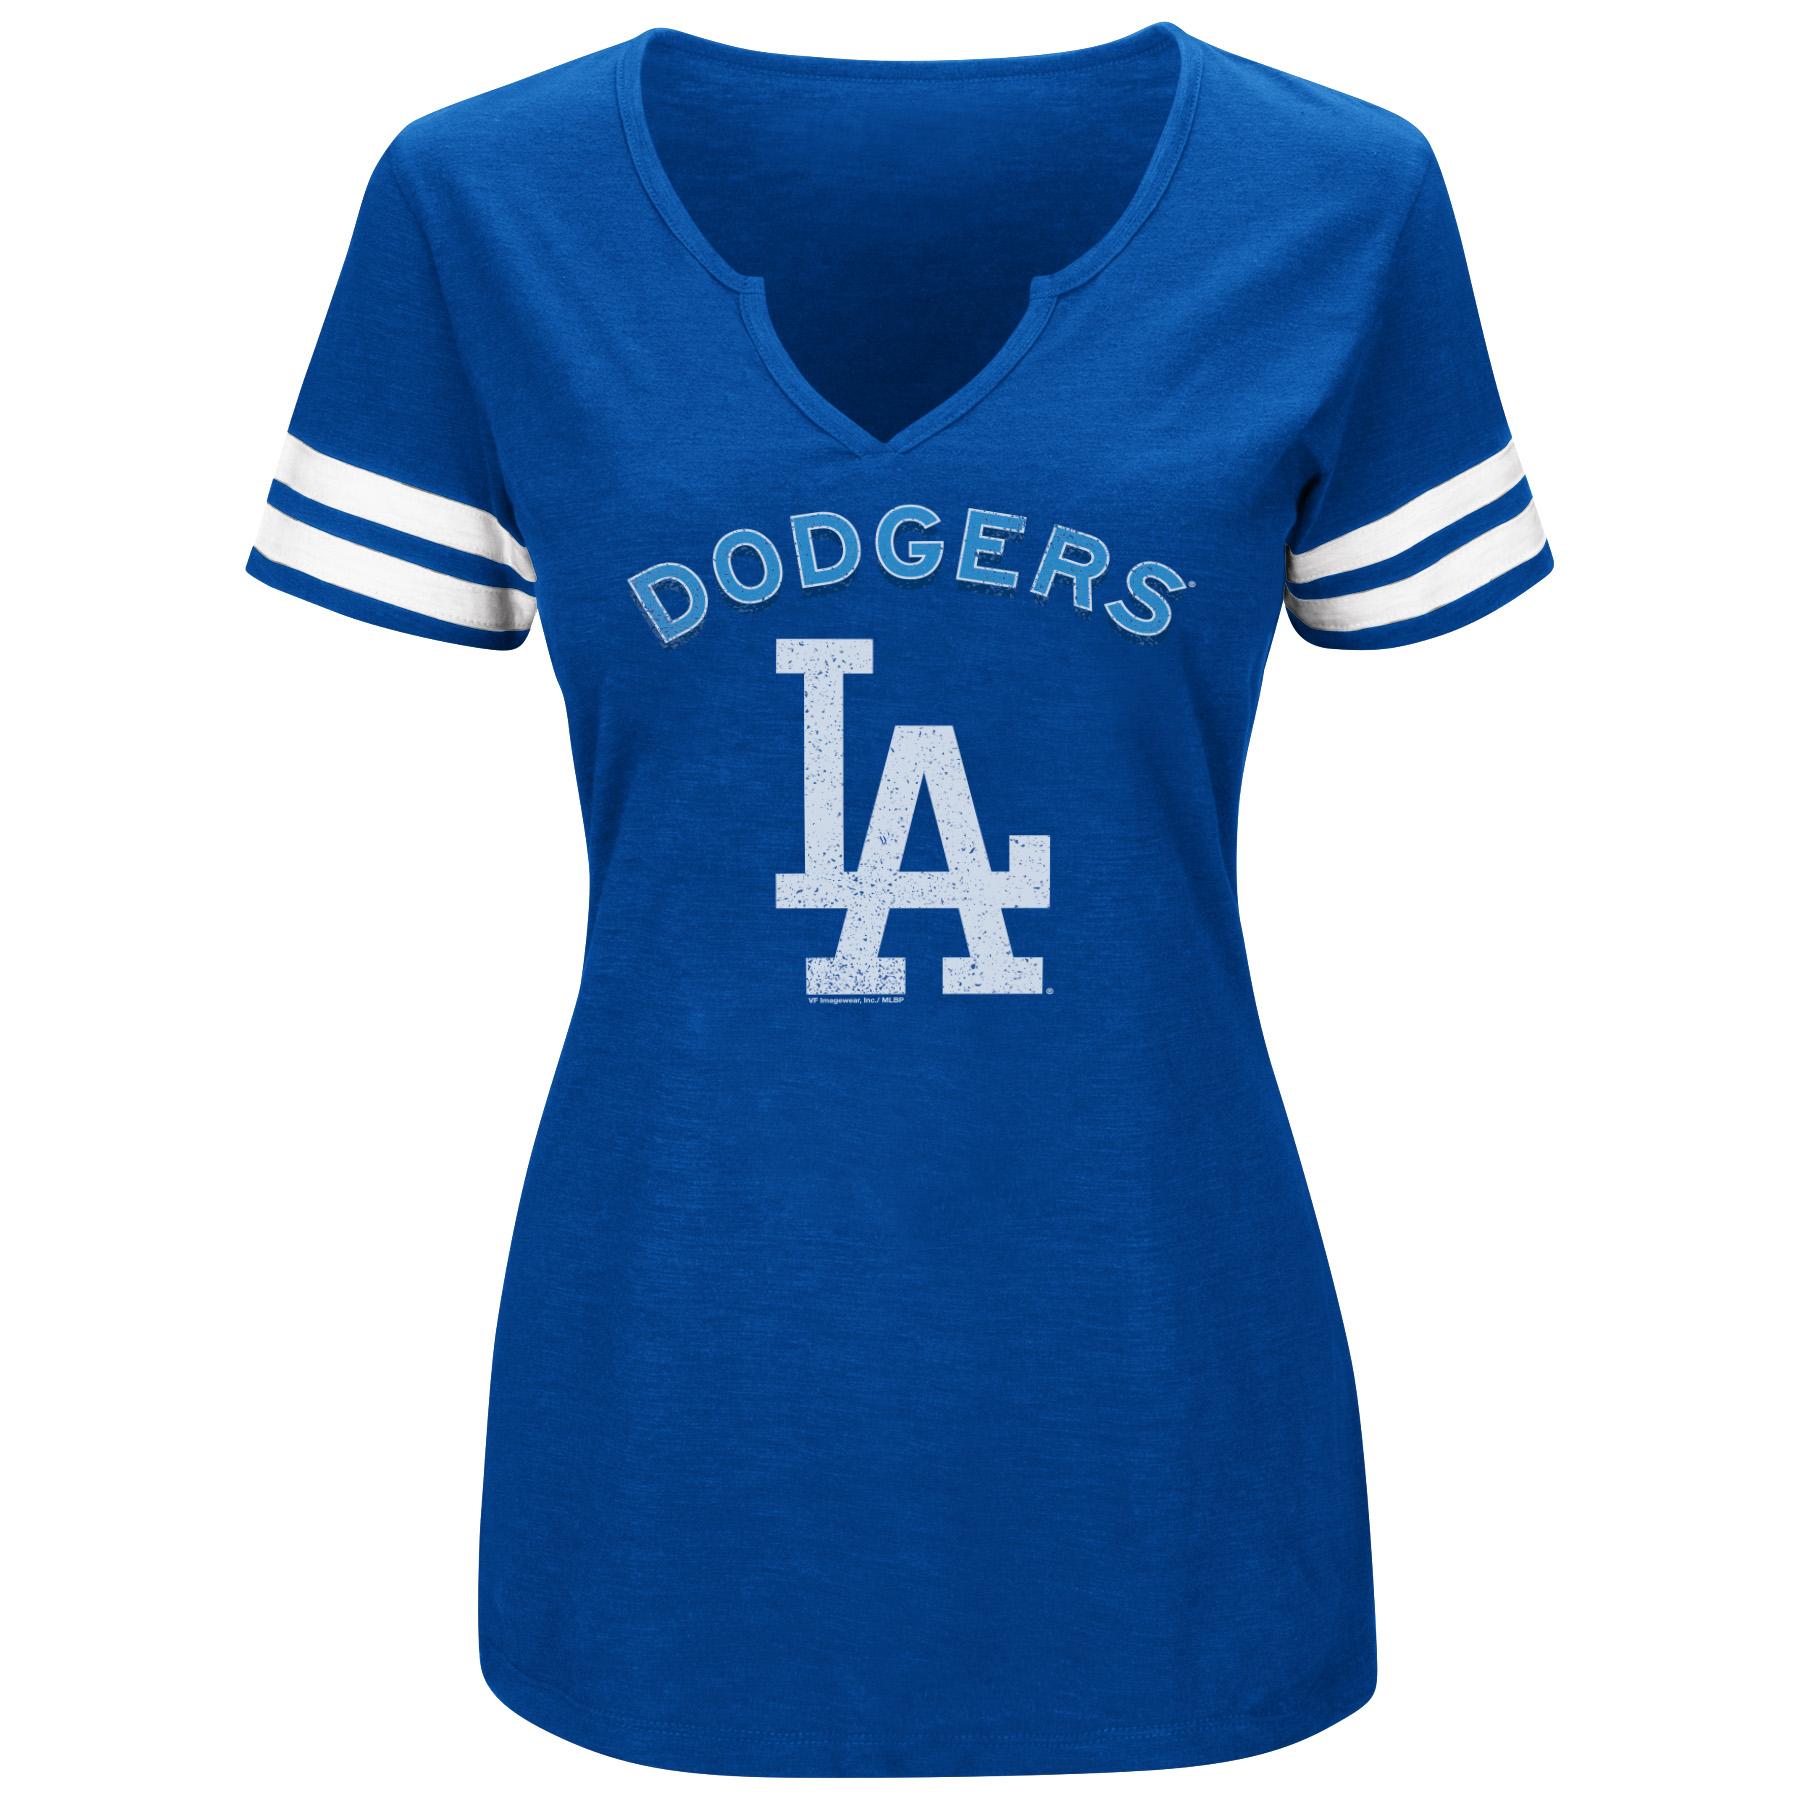 Women's Majestic Royal/White Los Angeles Dodgers Decisive Moment V-Notch T-Shirt